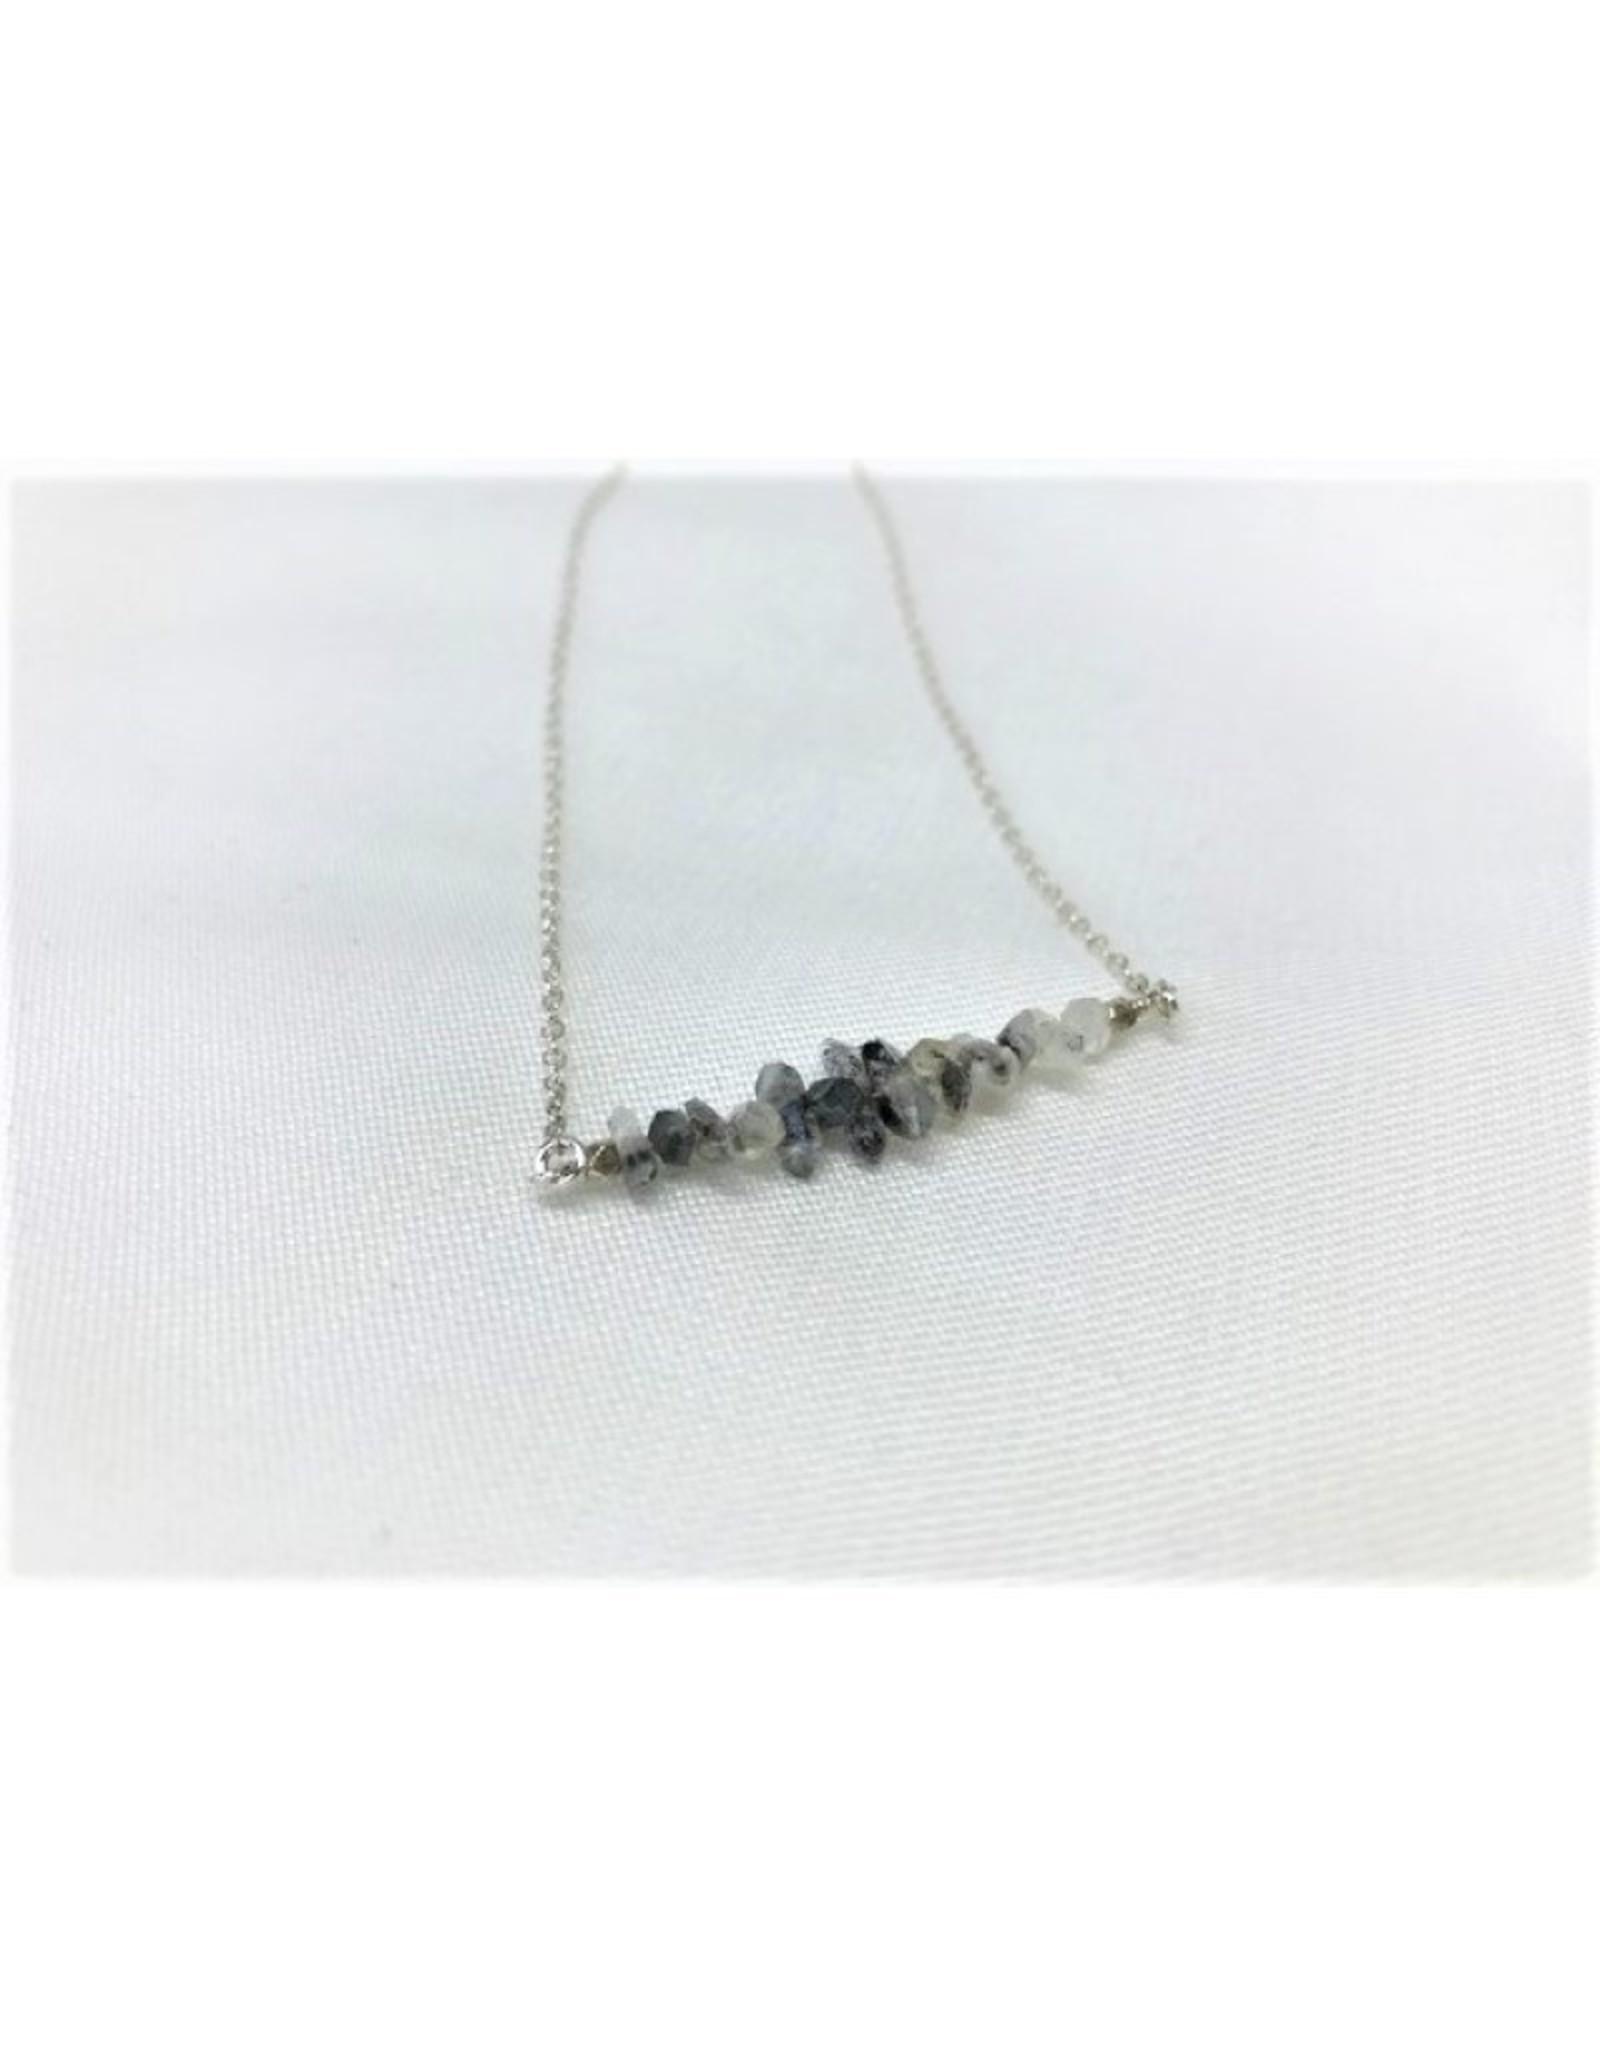 Gemstone Bar Necklace - Herkimer Diamond